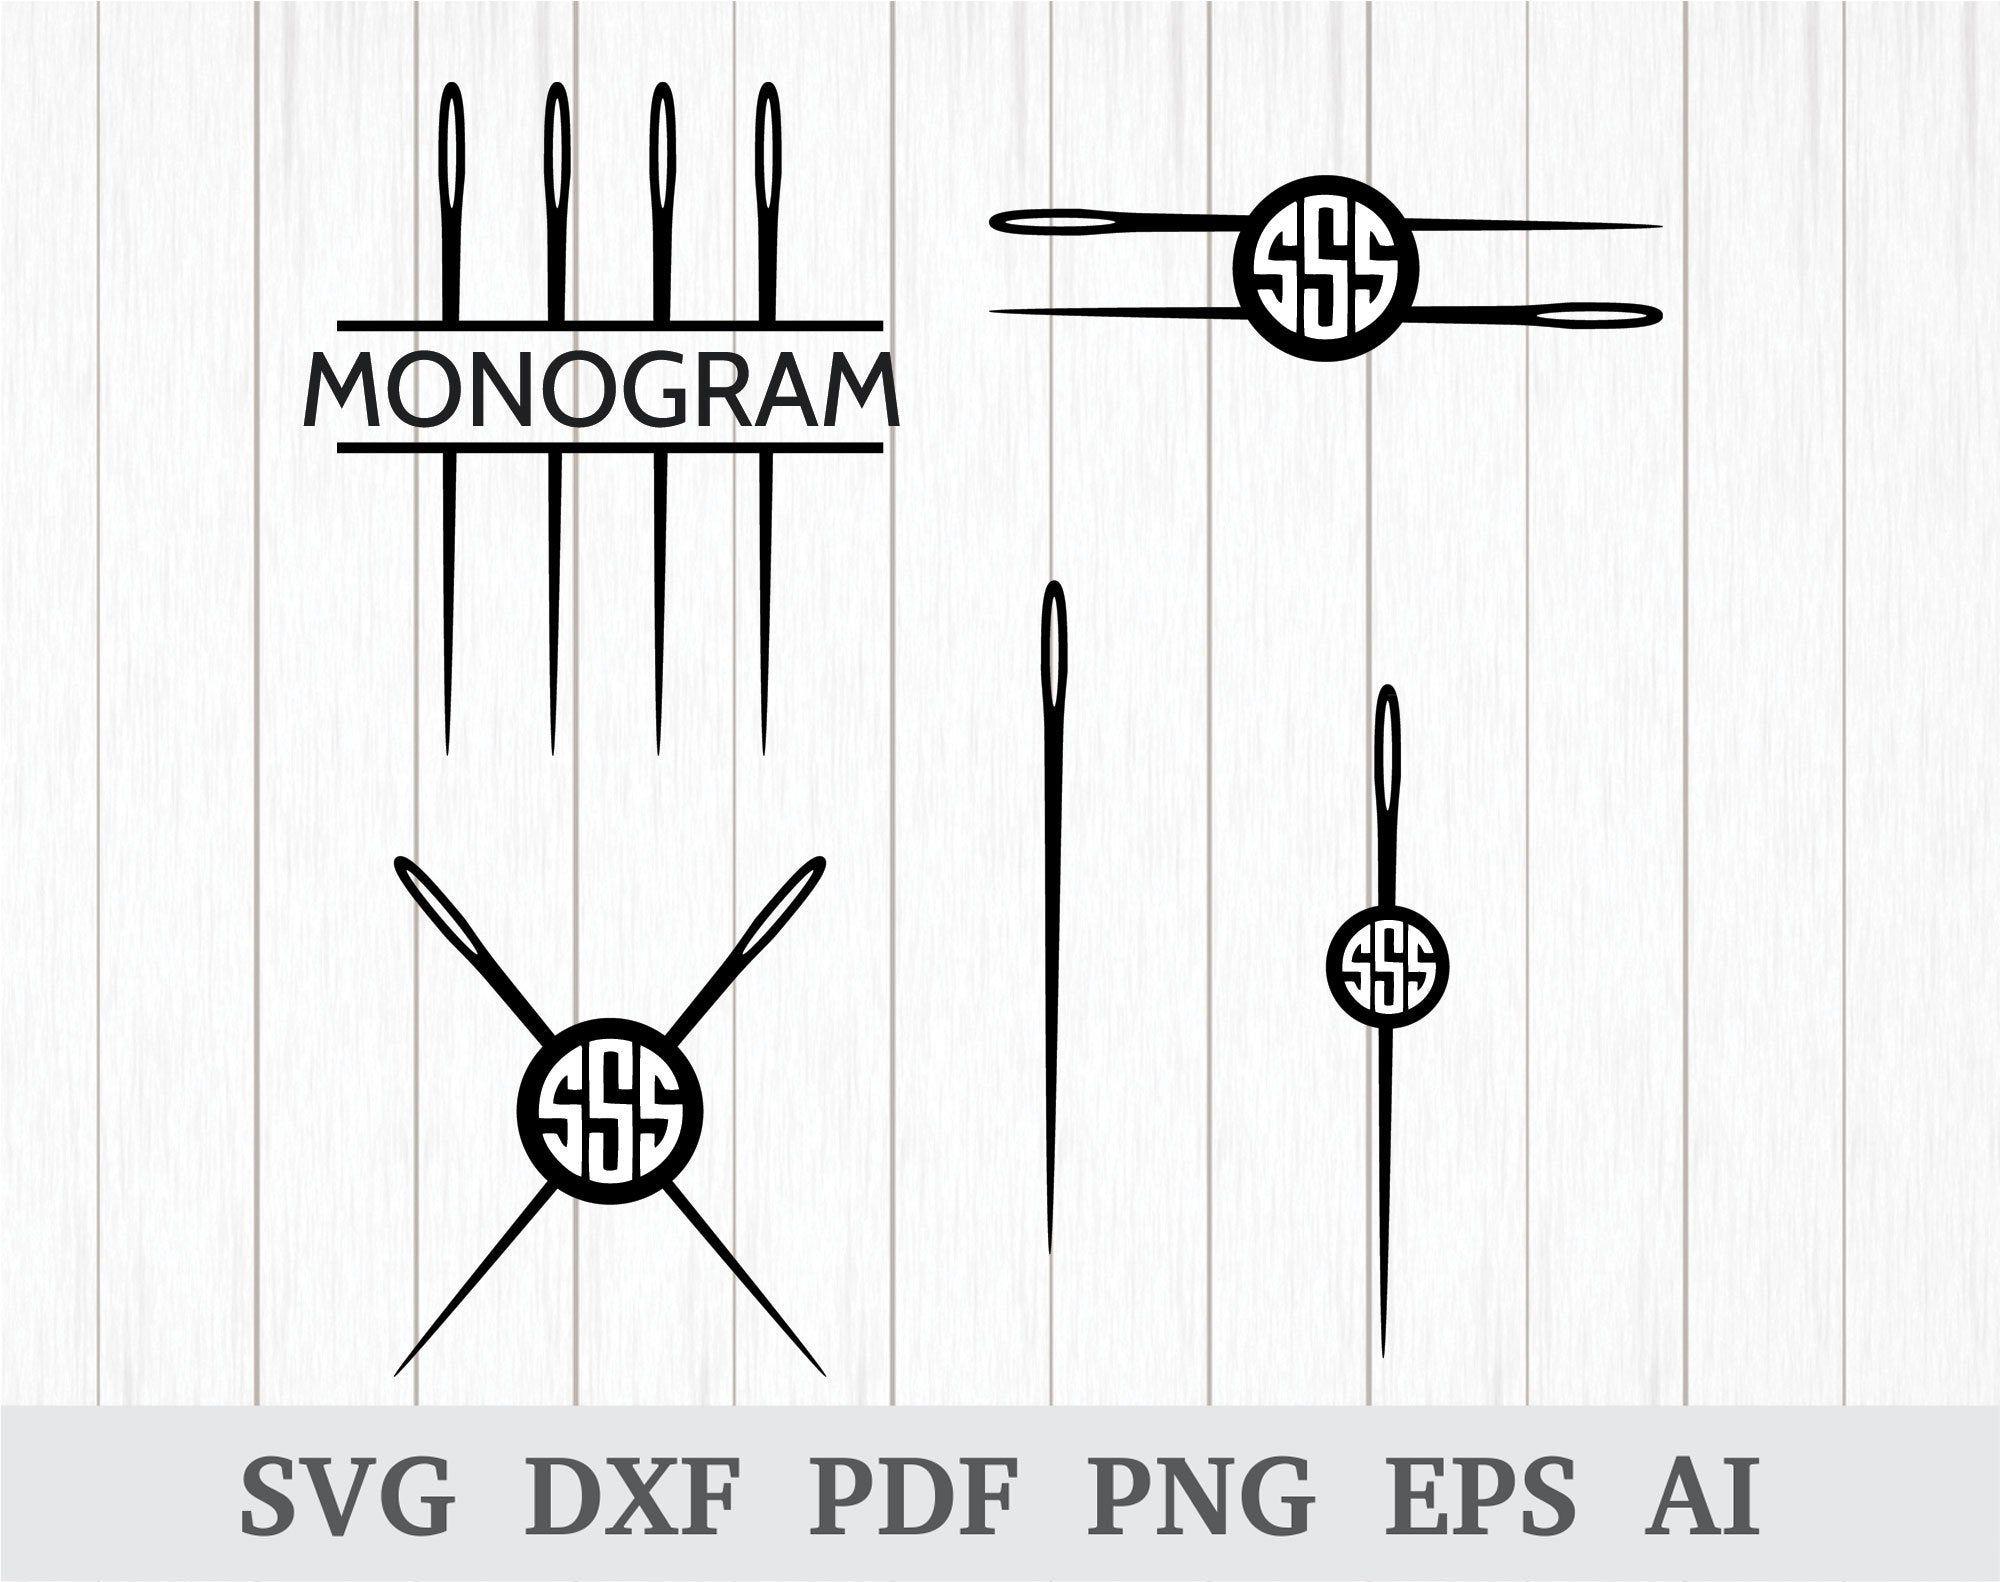 Sewing Needle svg, Needle SVG, Sewing Needle Monogram SVG